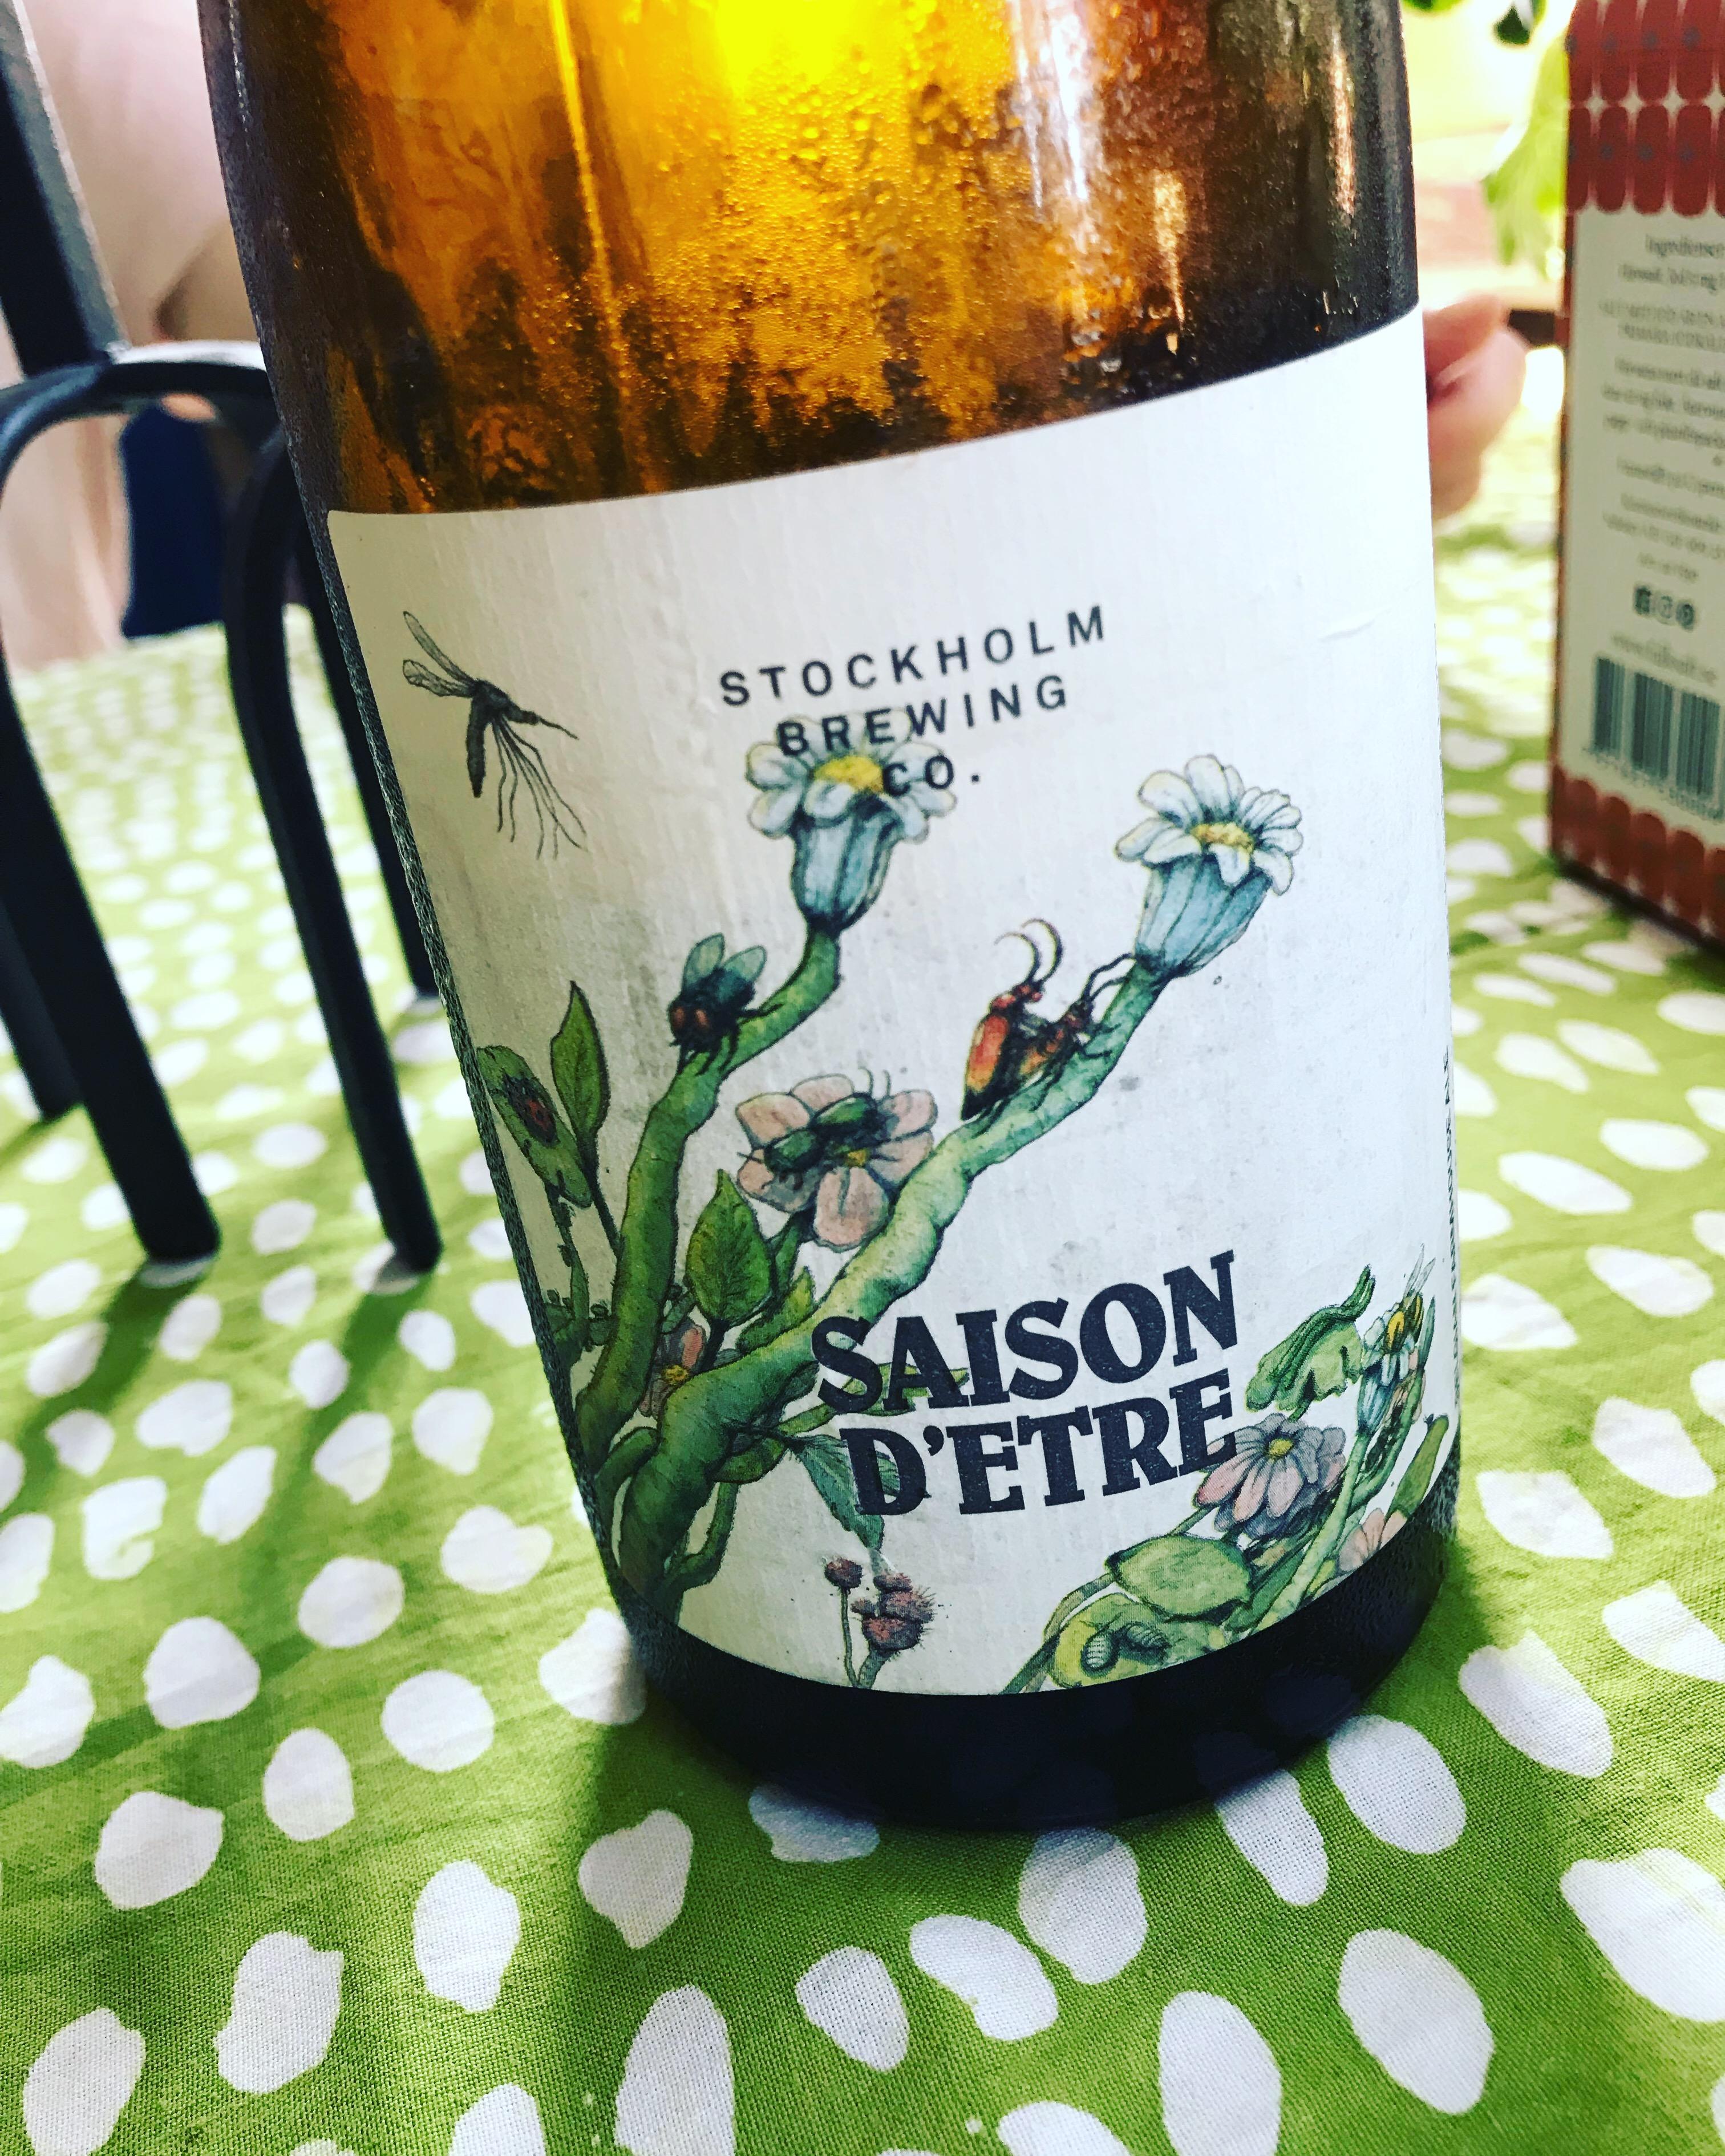 Saison d'être från Stockholm brewing. Foto: Joel Linderoth.